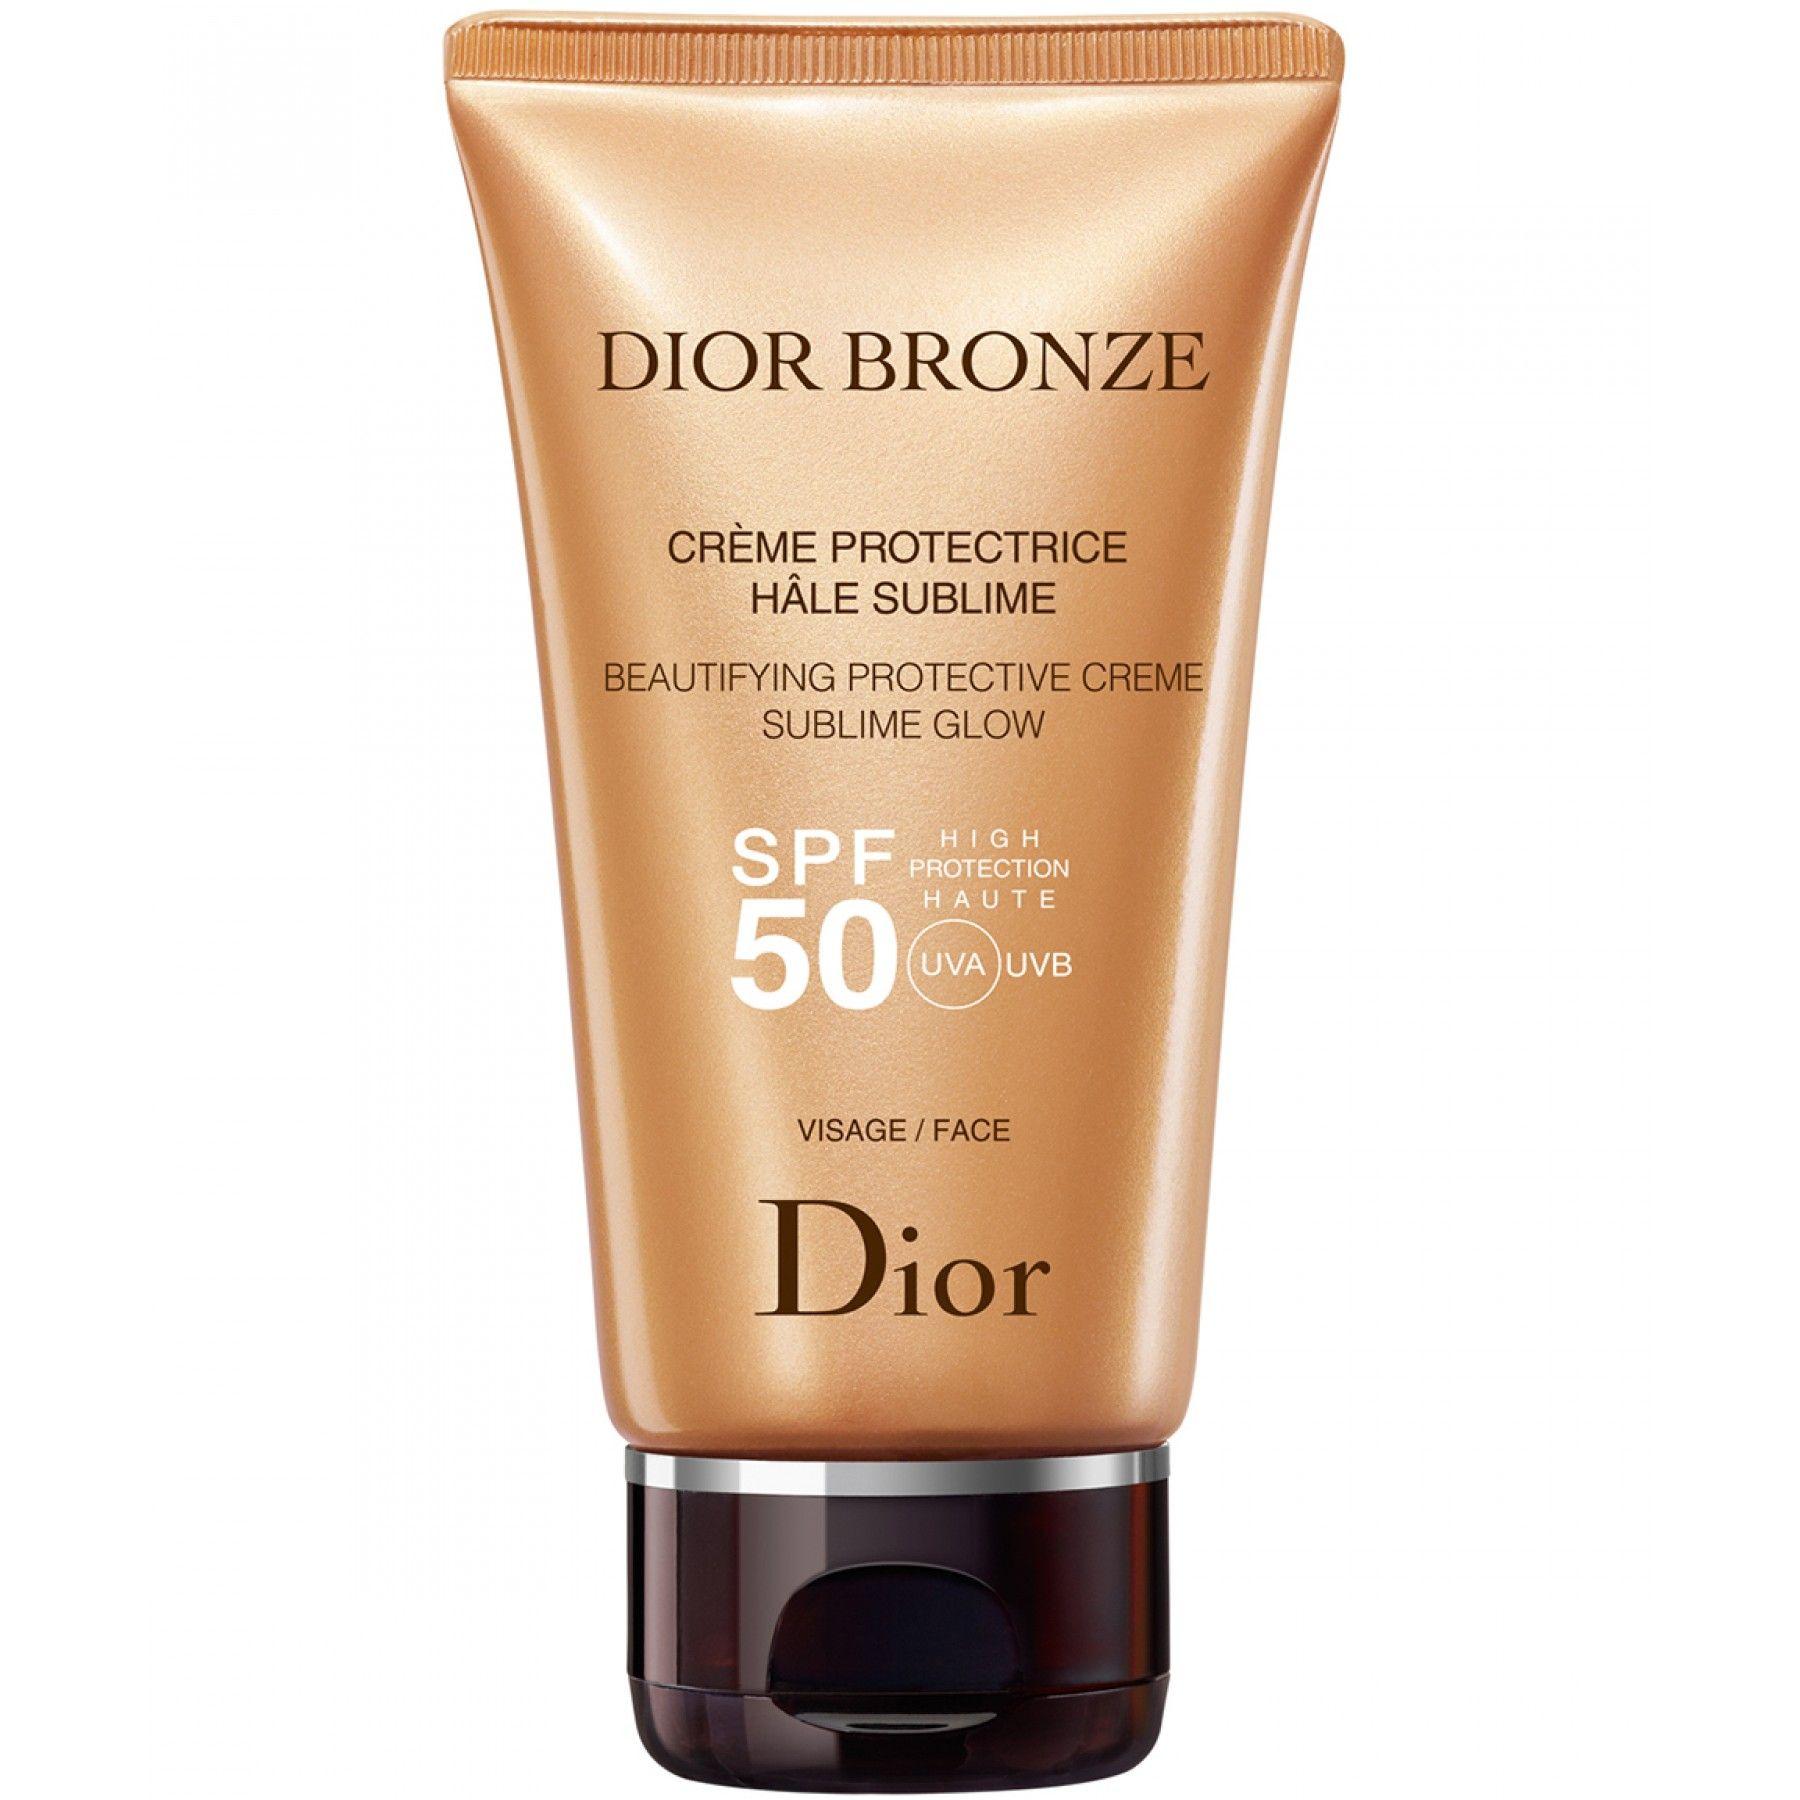 Christian Dior Crema Rostro Bronce Spf50 Crema Protectora Solar